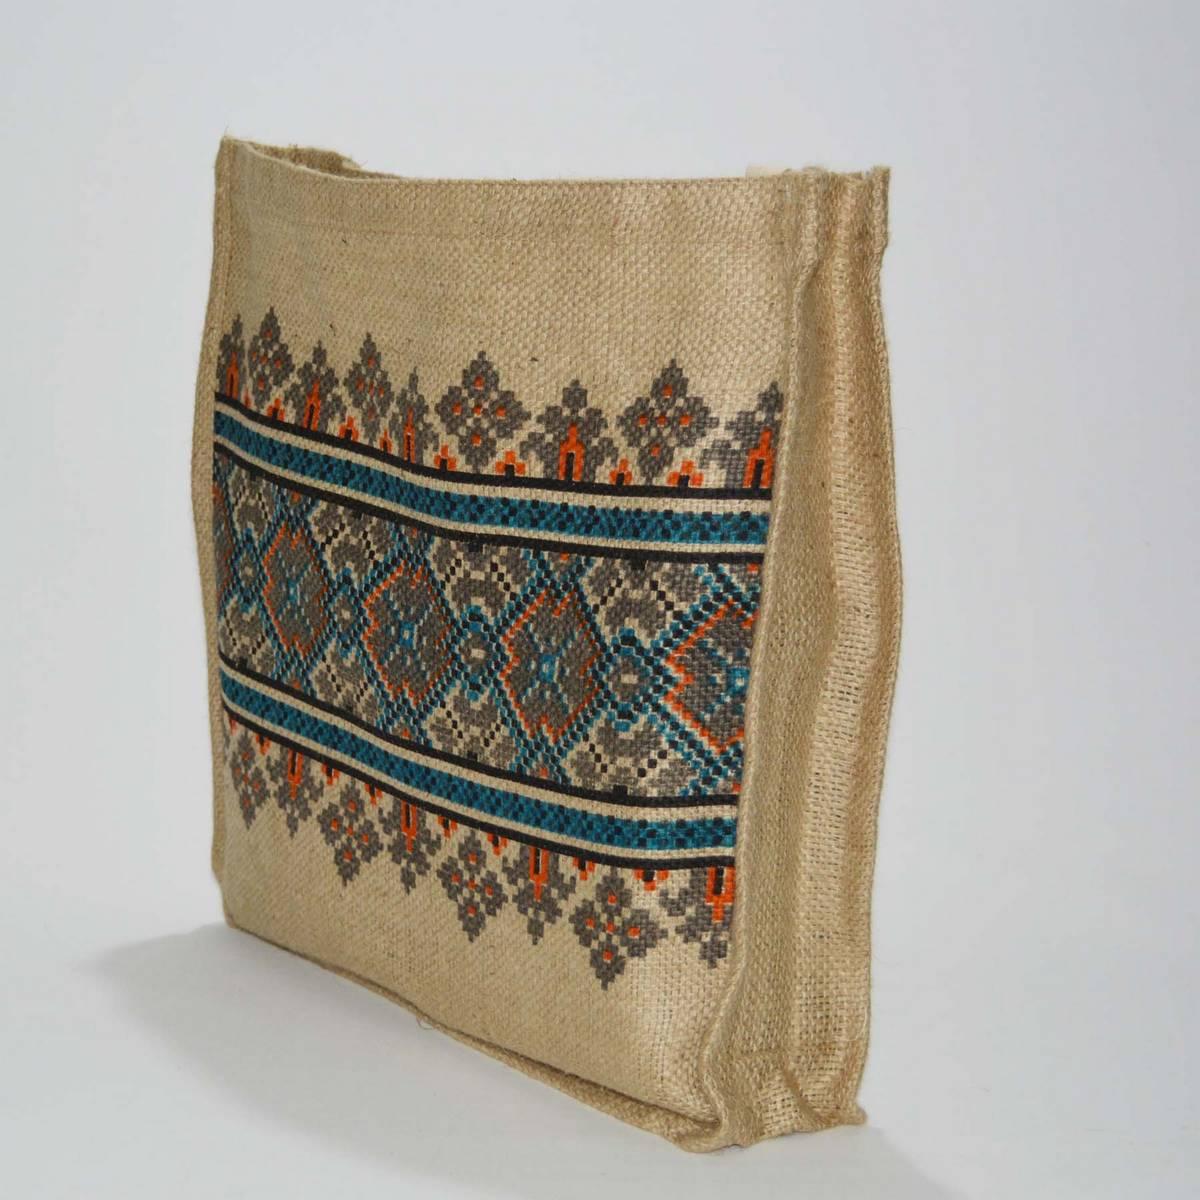 Jute Tote Bag Soft Cotton Handles Reusable Grocery Shopping Bag I Flaire